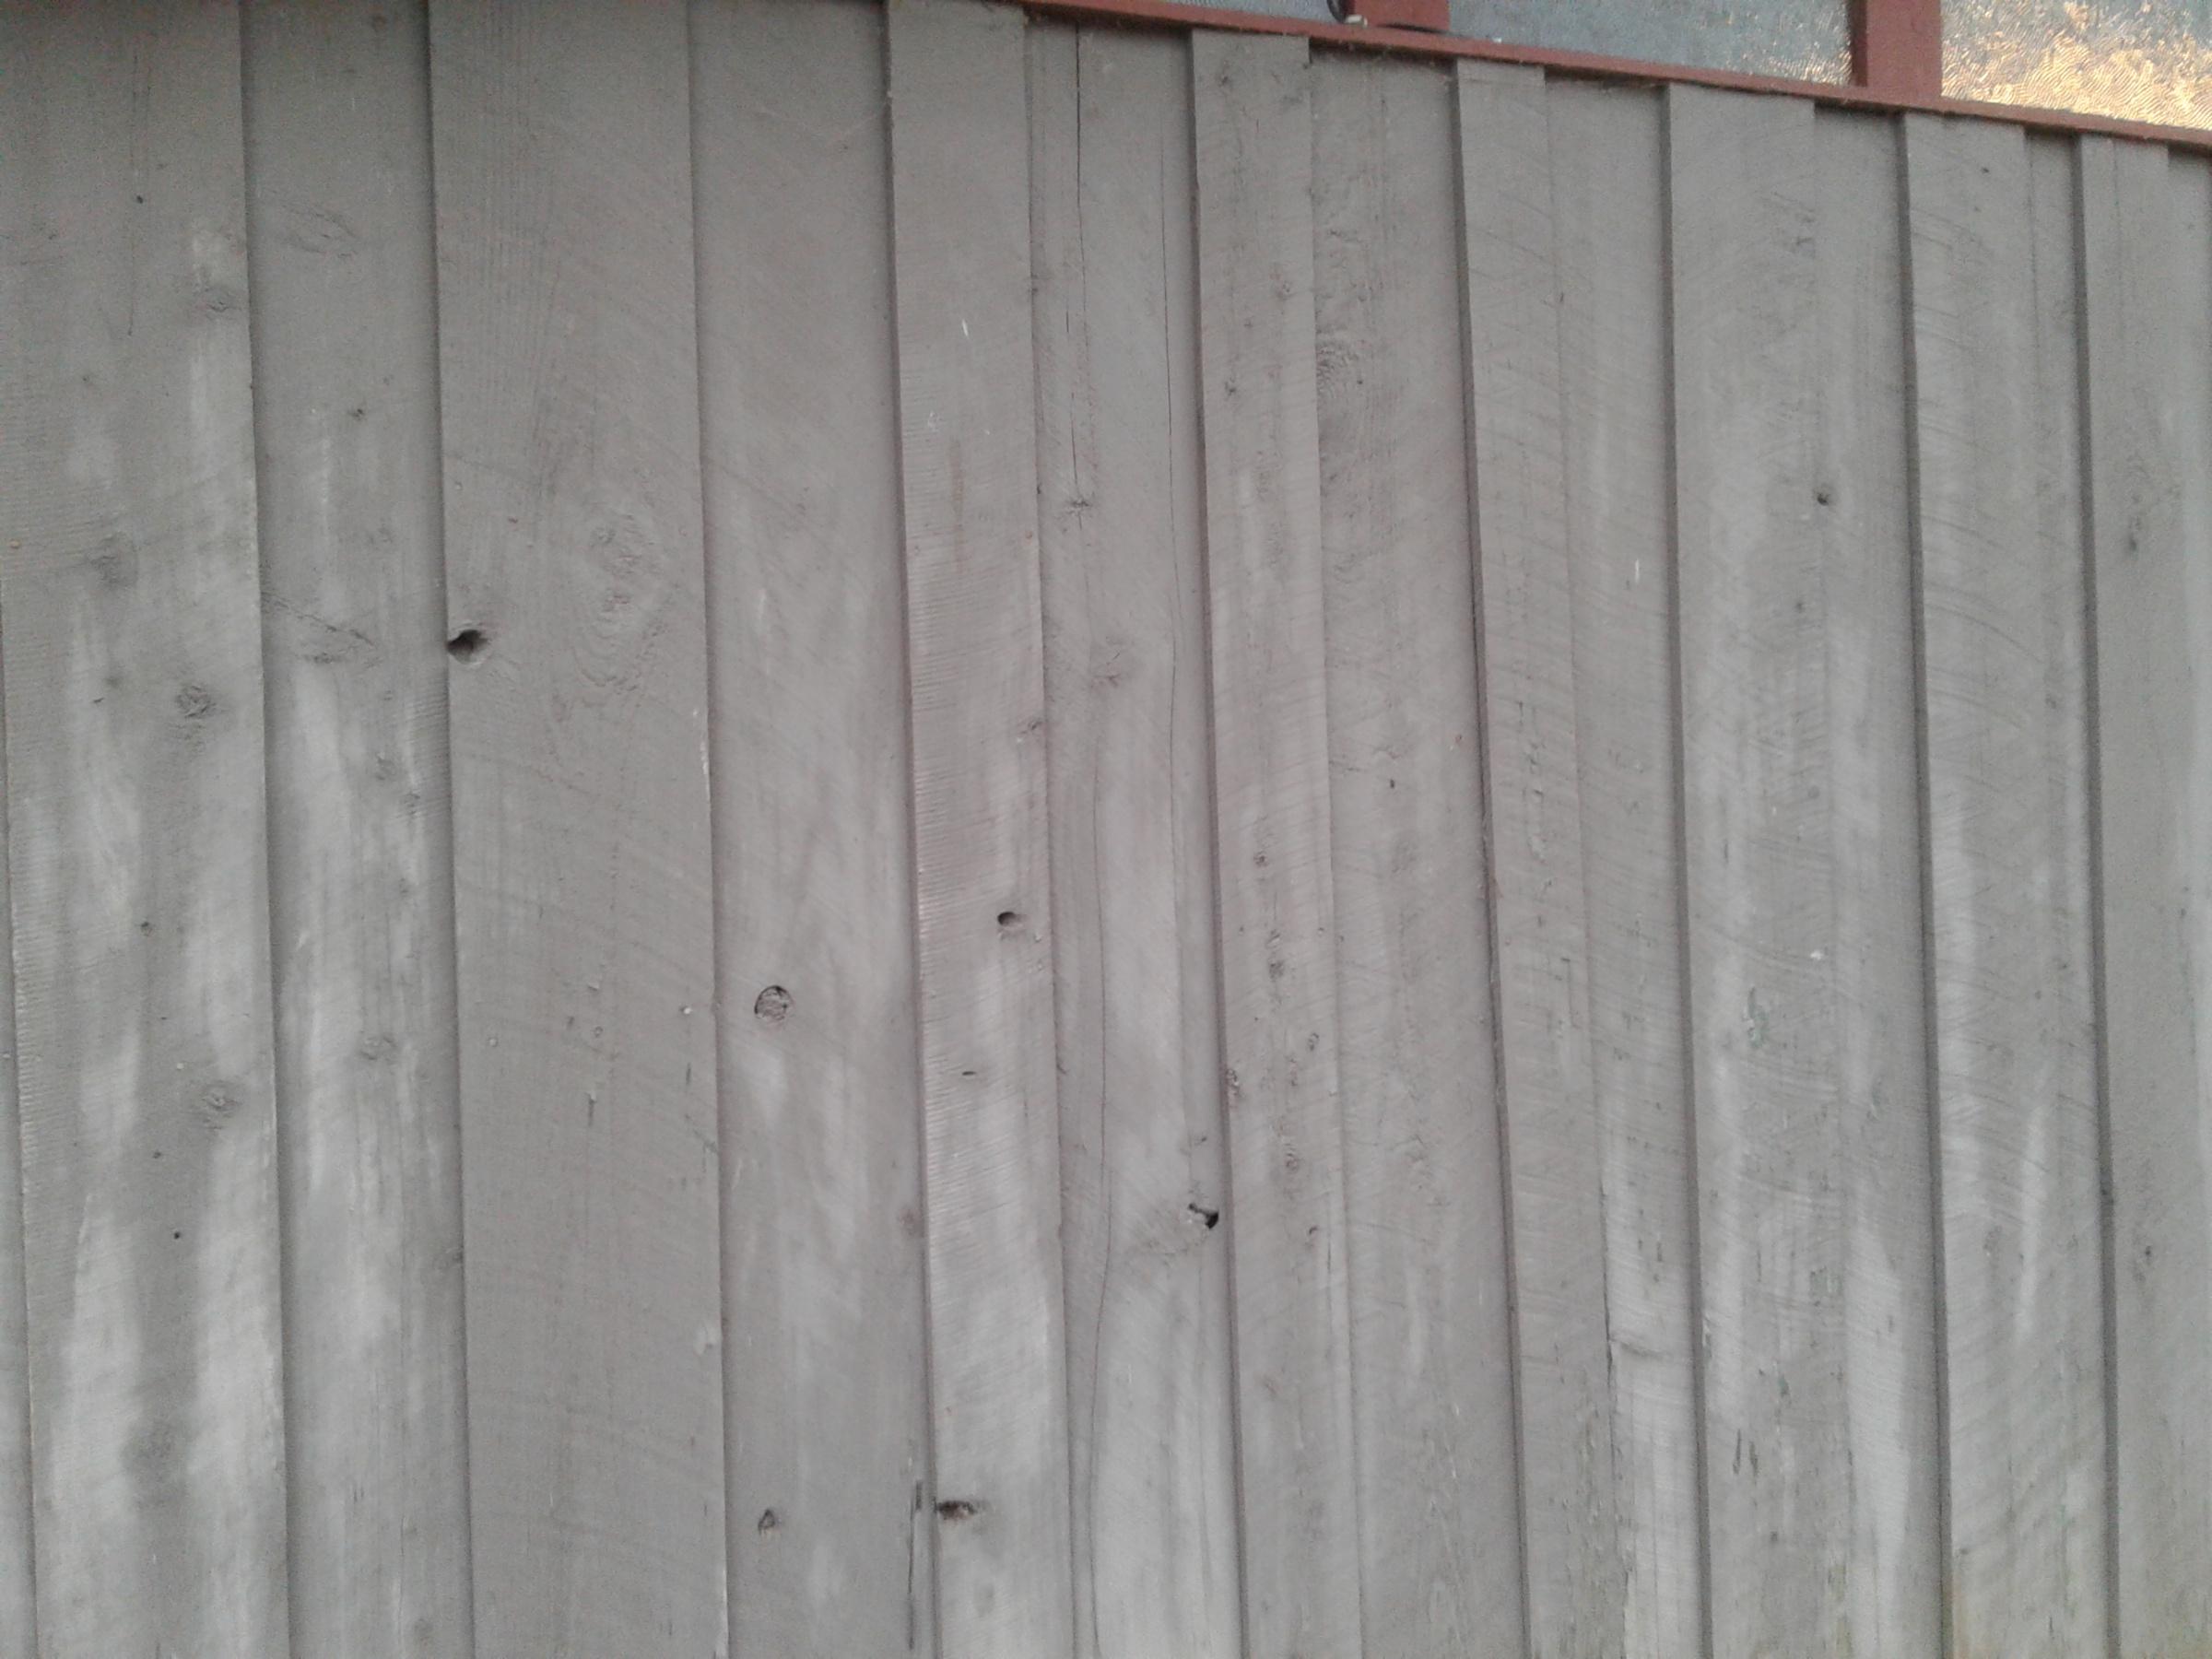 No insulation-20191123_152516.jpg